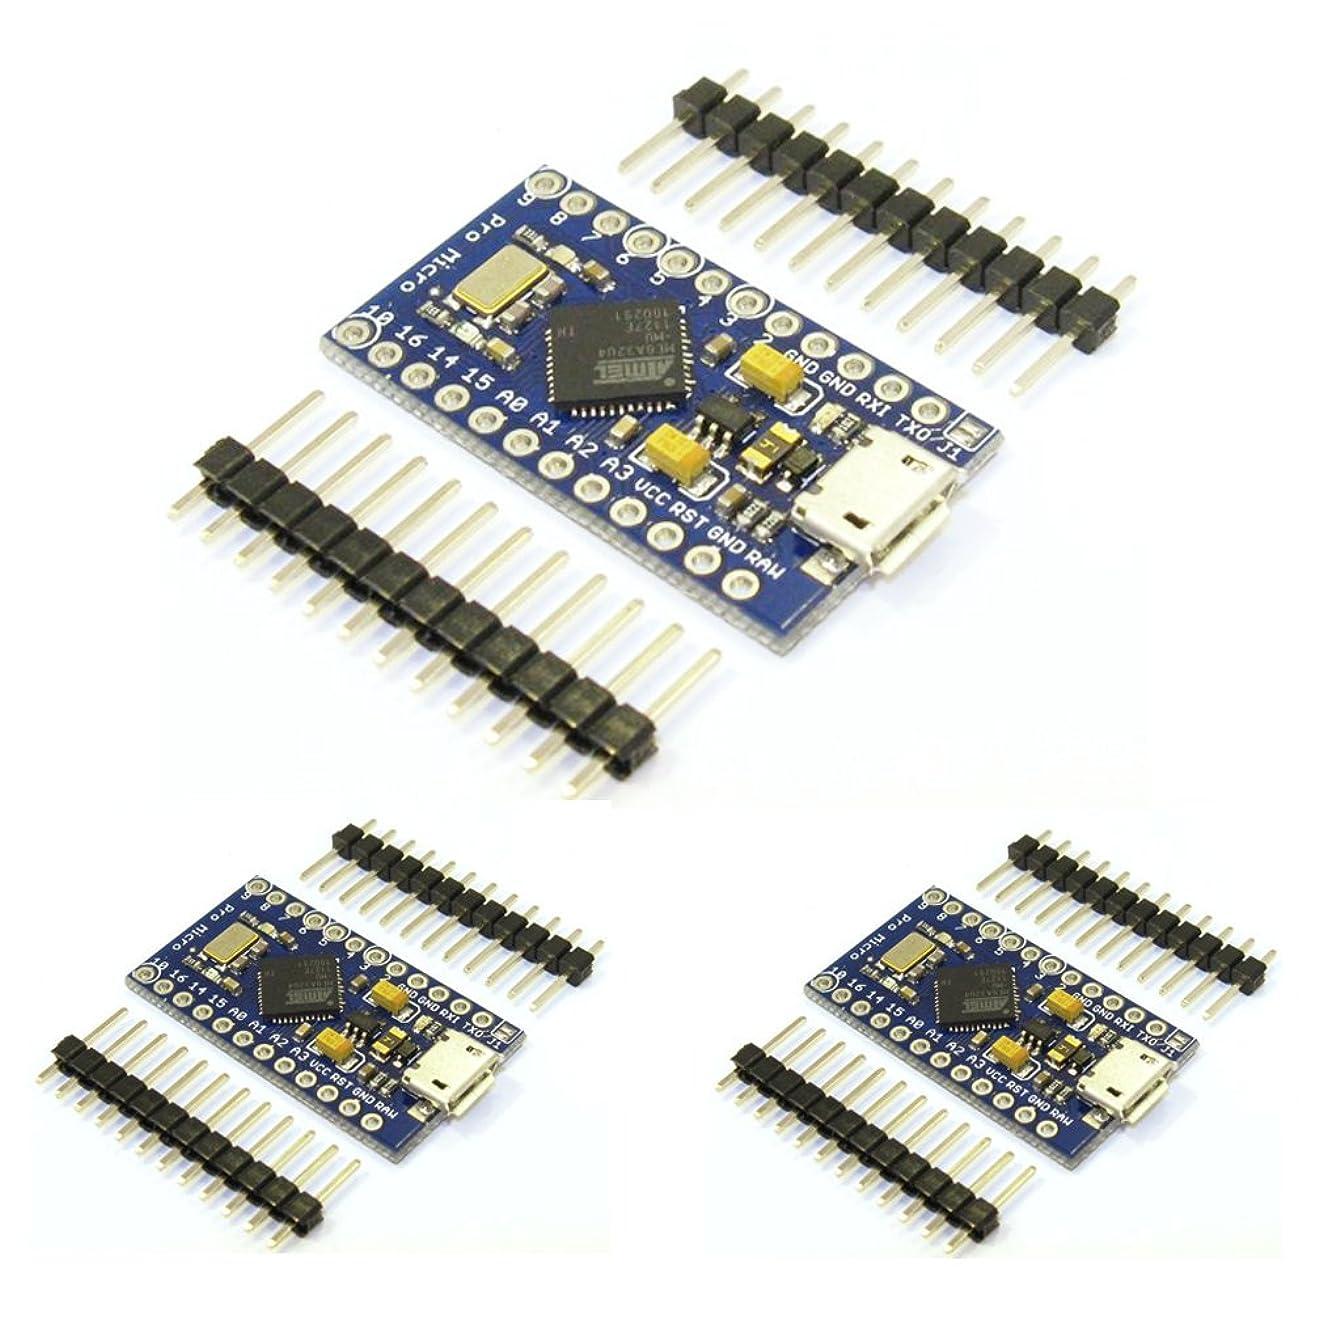 HiLetgo 3pcs Pro Micro Atmega32U4 5V 16MHz Bootloadered IDE Micro USB Pro Micro Development Board Microcontroller Compatible to Arduino Pro Micro Serial Connection with Pin Header